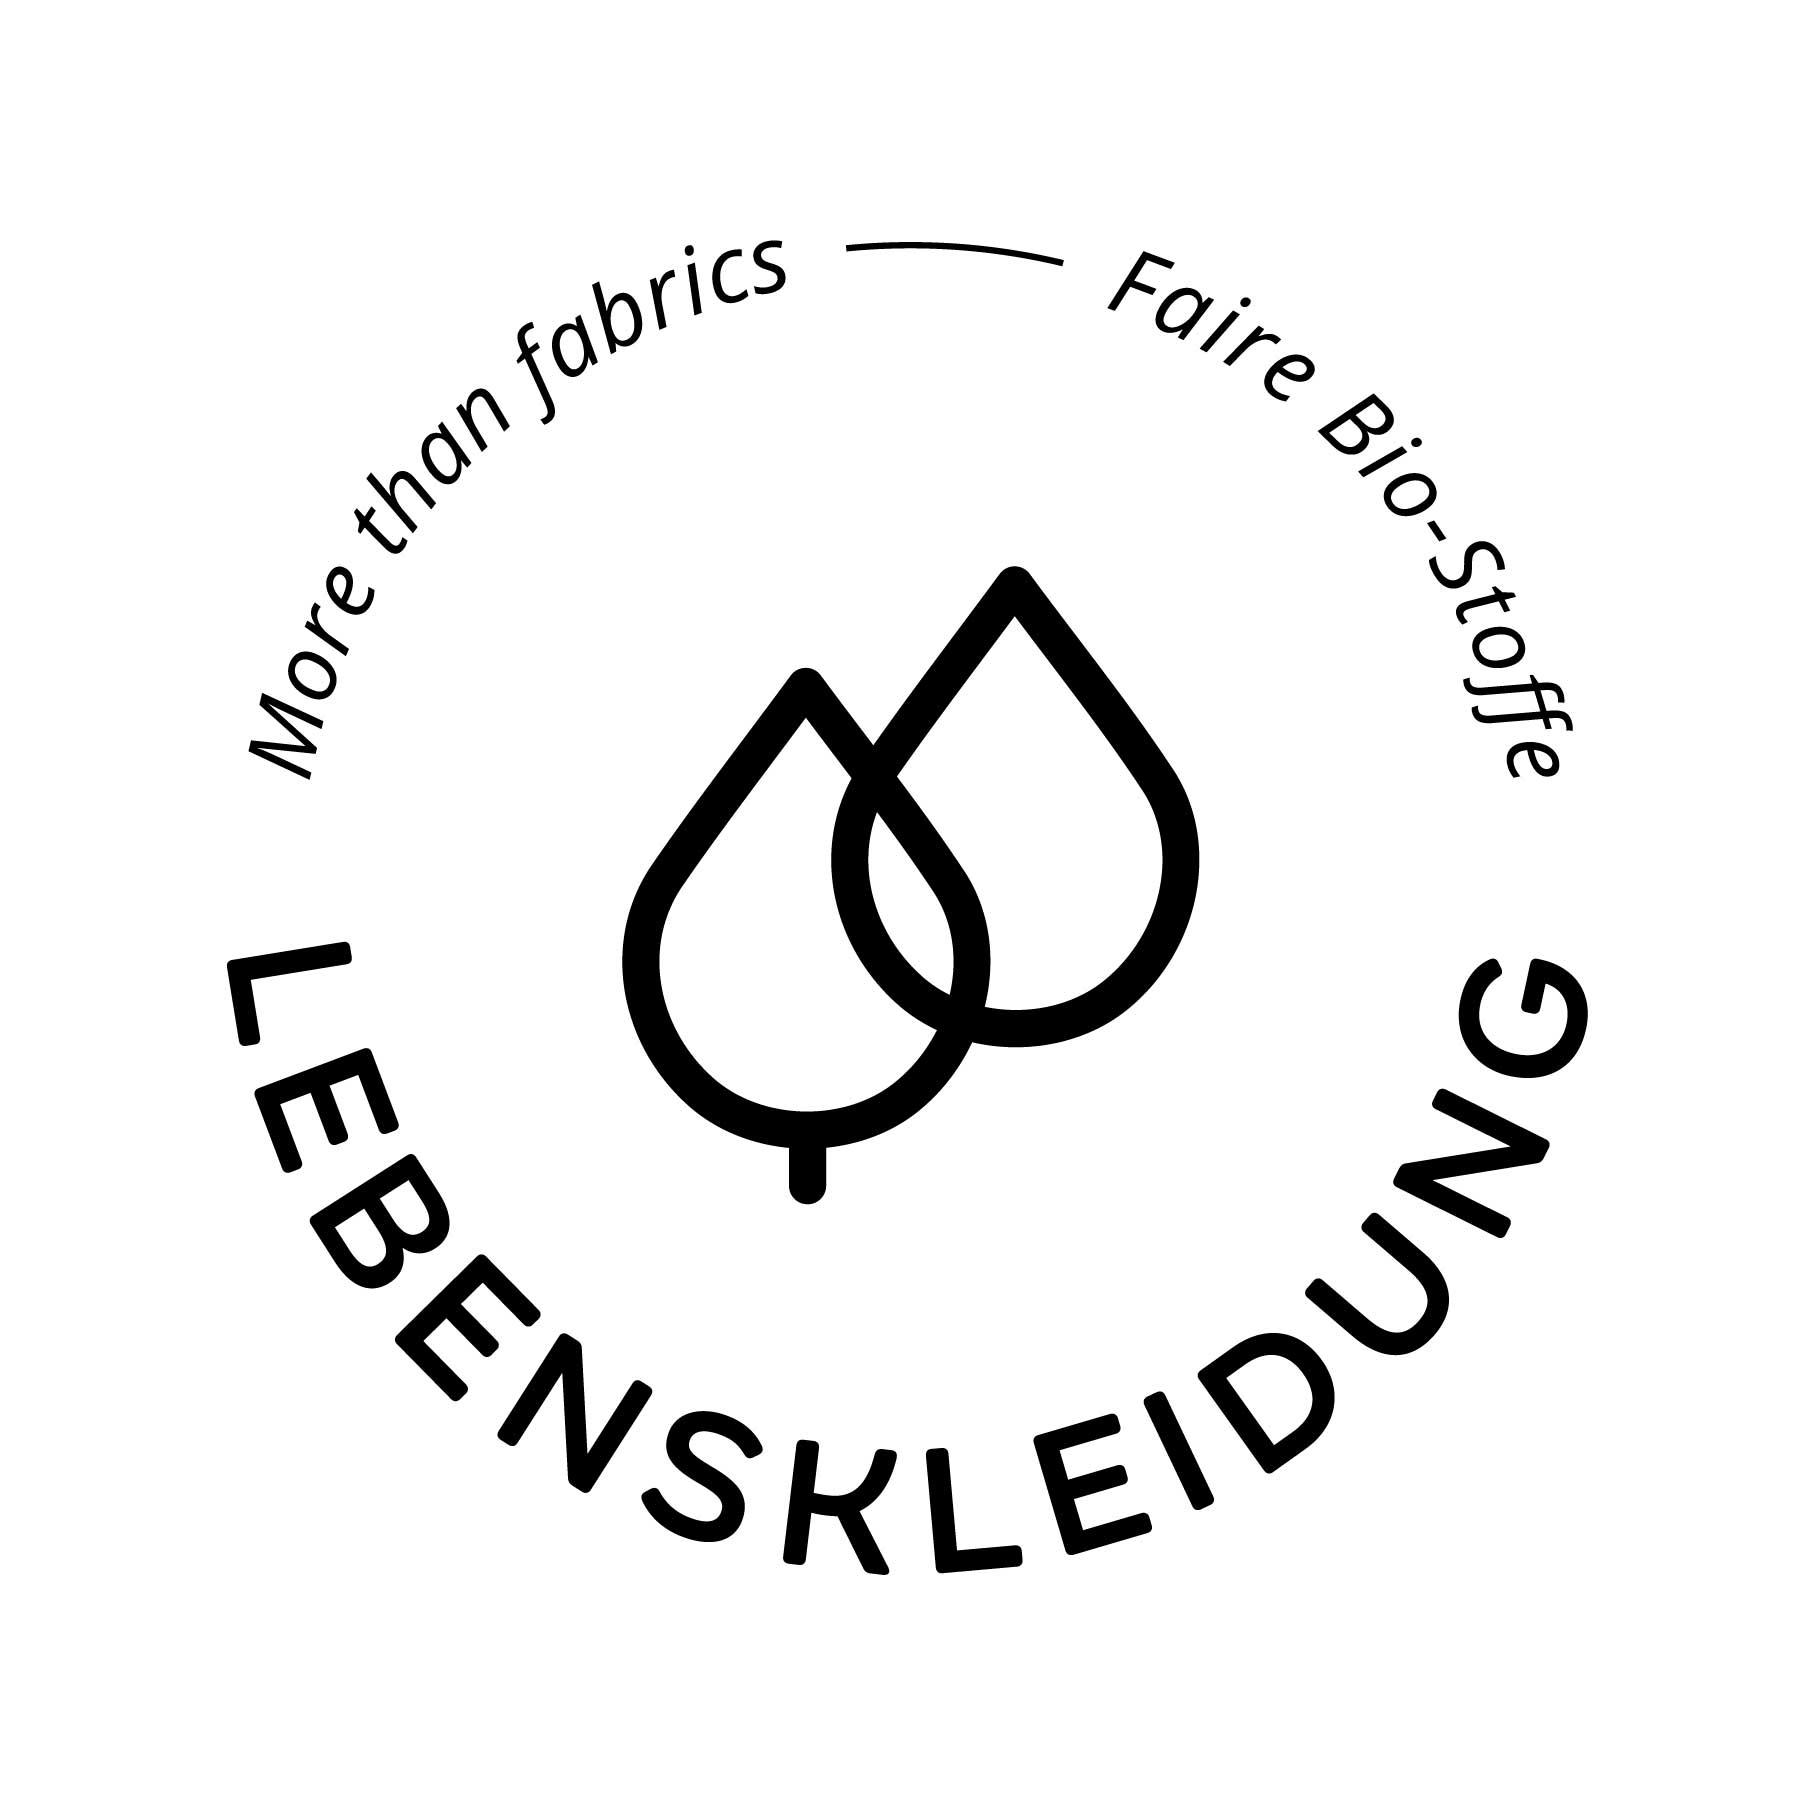 Tela orgánica Cretonne - impresión digital